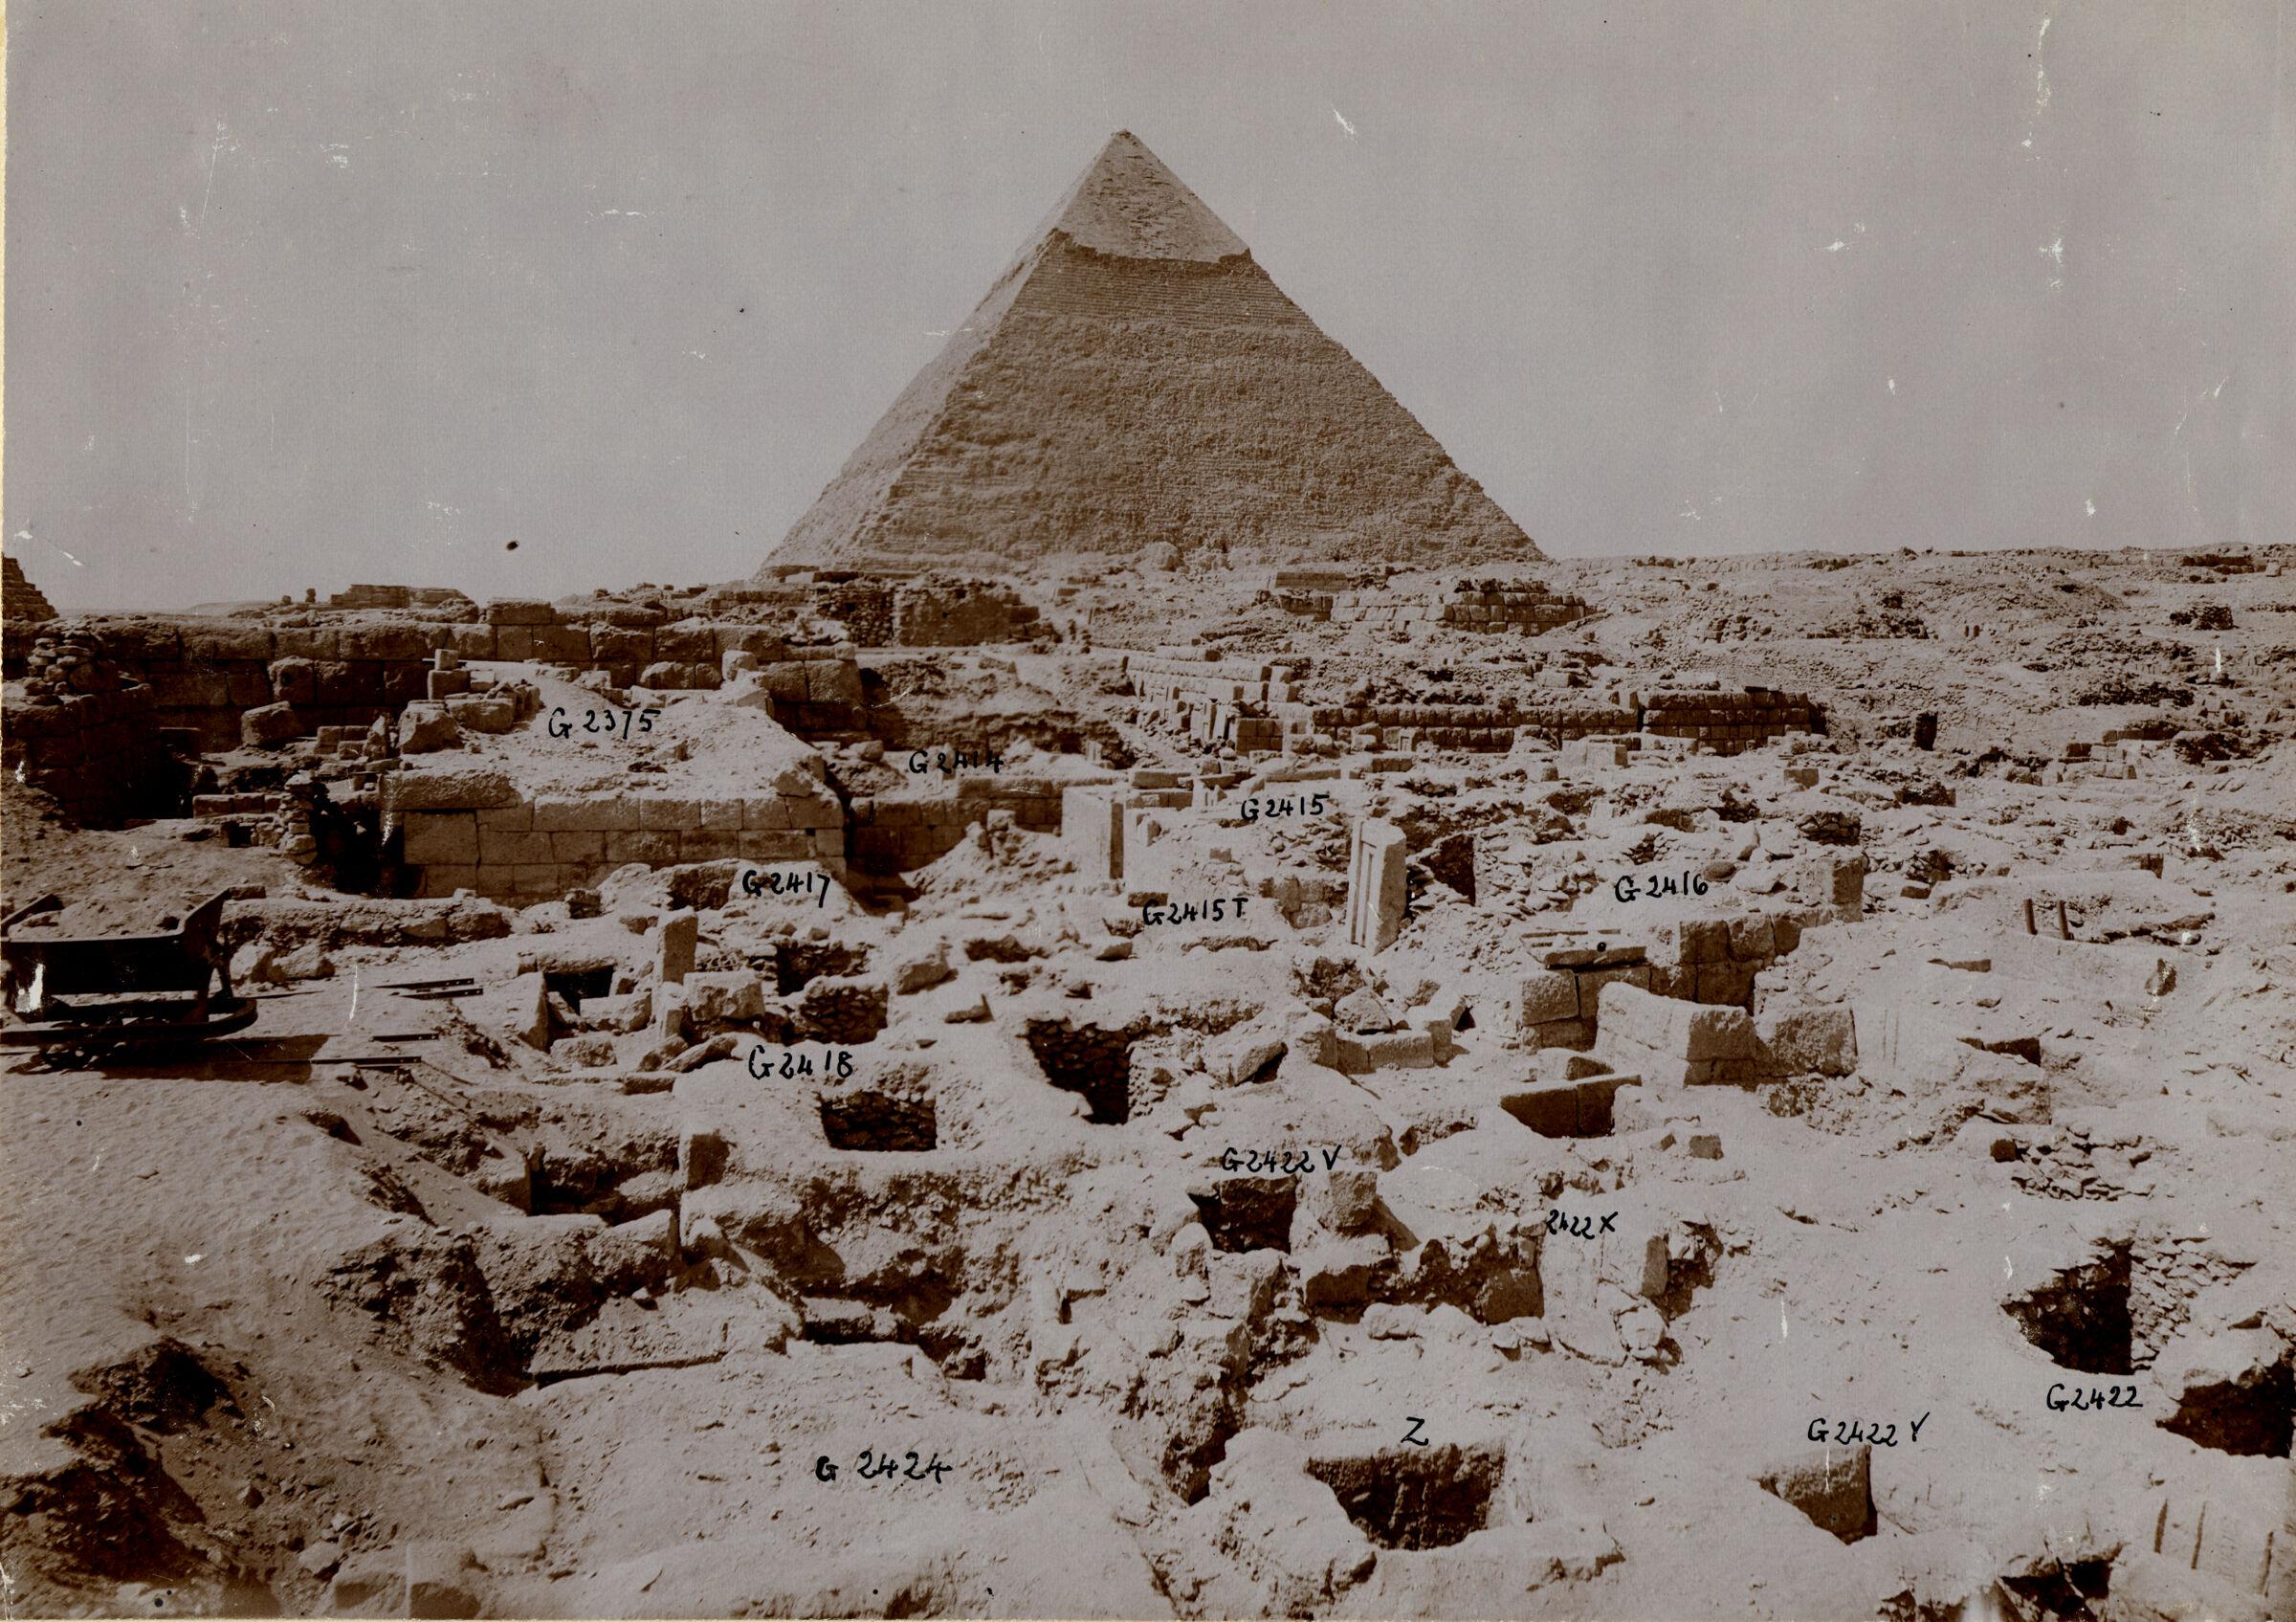 Western Cemetery: Site: Giza; View: G 2424+2425, G 2418, G 2417, G 2375, G 2422, G 2416, G 2415, G 2414